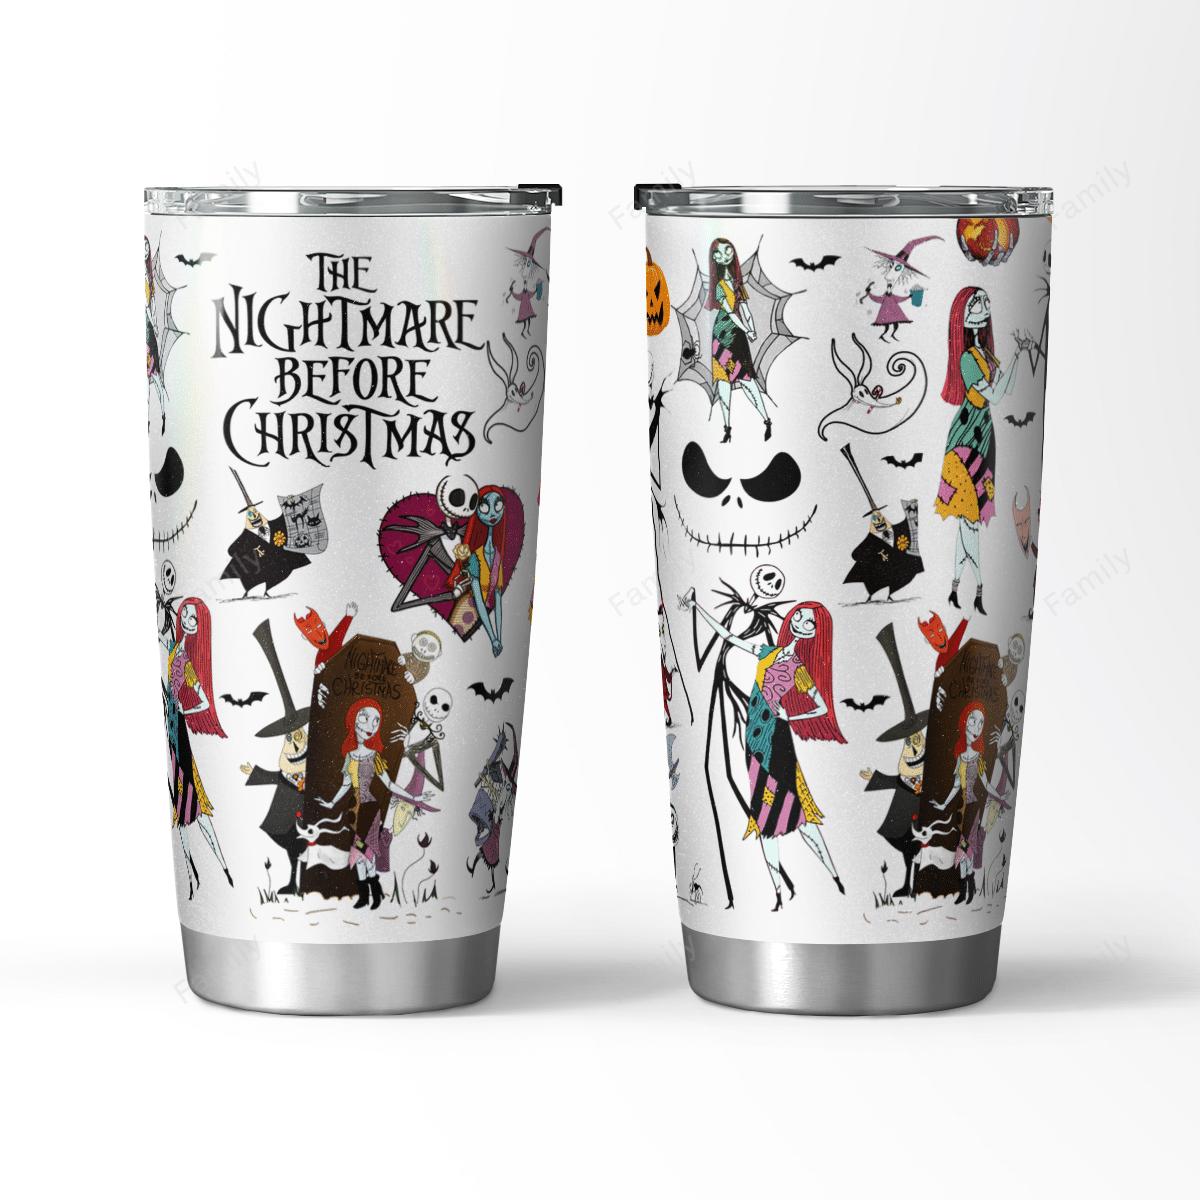 THE NIGHTMARE BEFORE CHRISTMAS HALLOWEEN TUMBLER